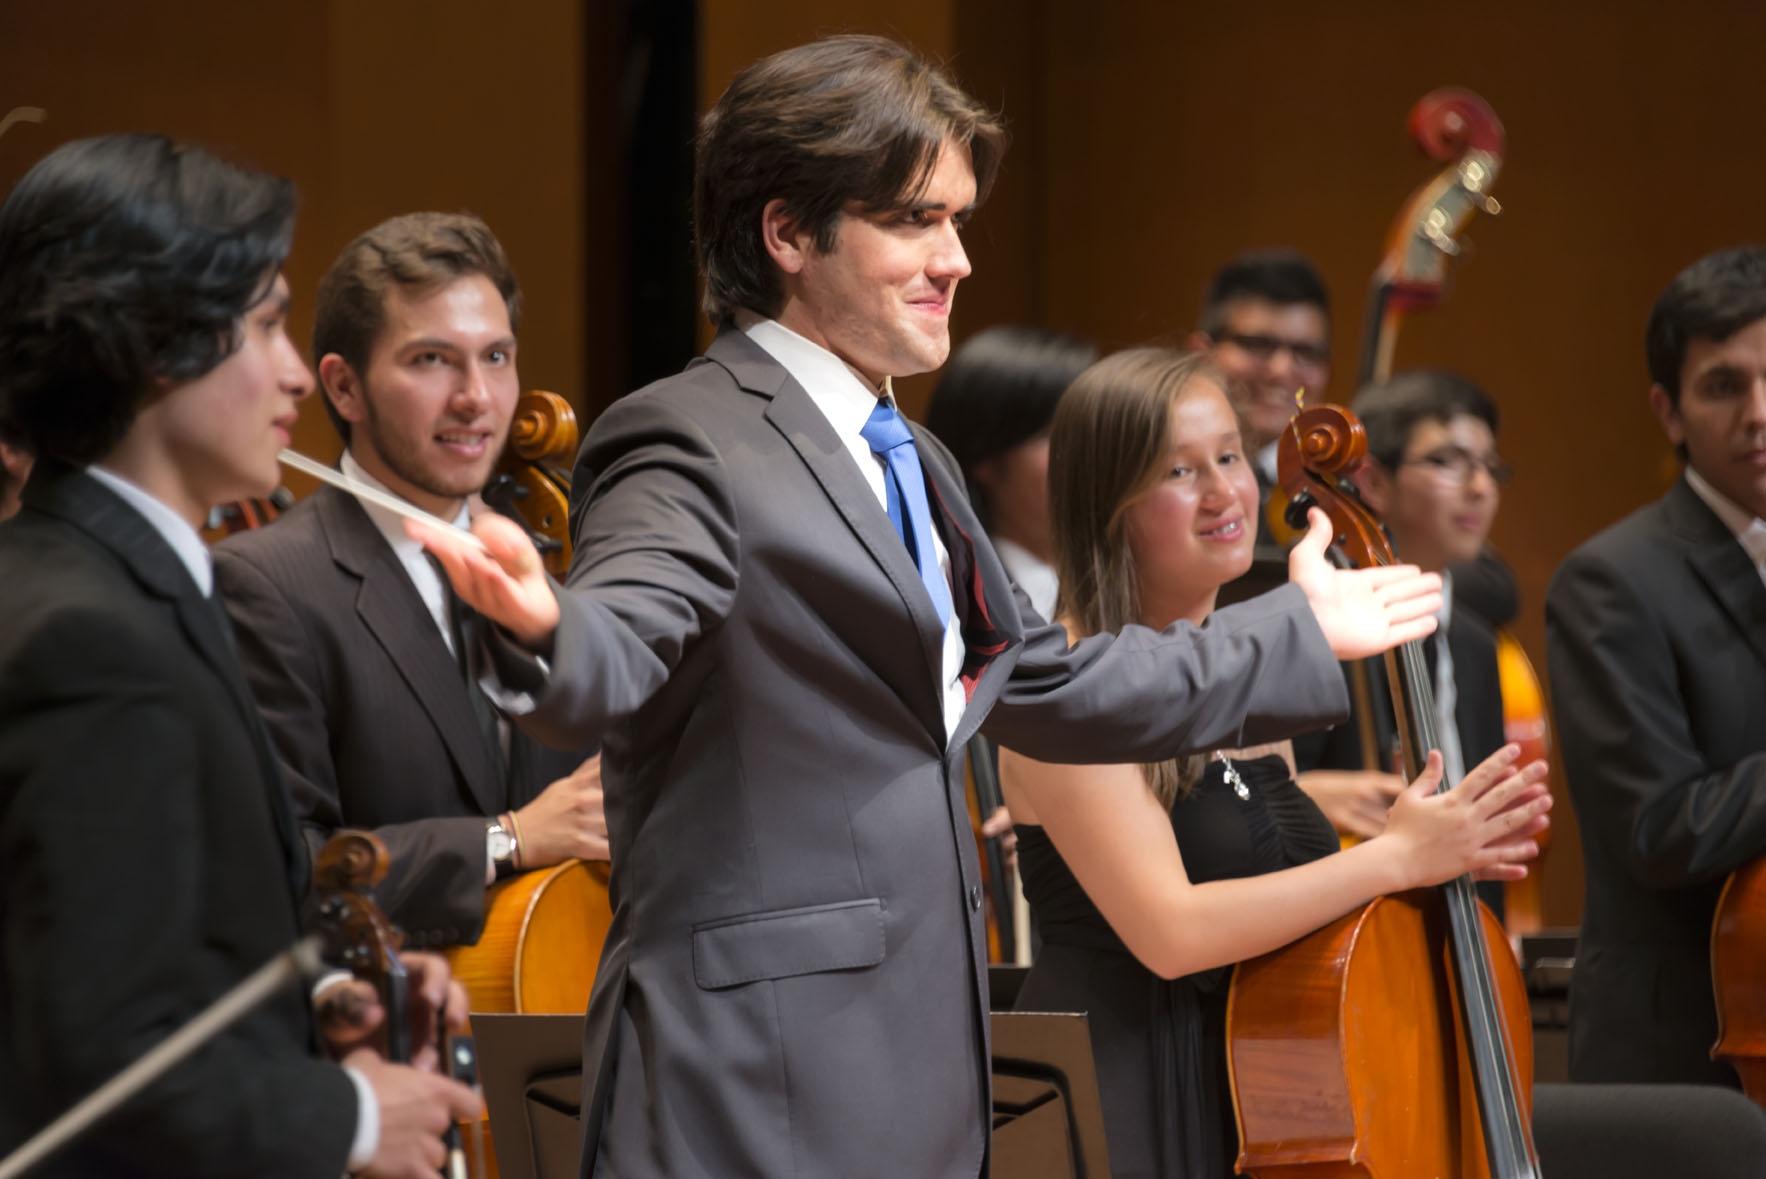 Manuel López-Gómez y la Orquesta Sinfónica Metropolitana Batuta de gira por Venezuela